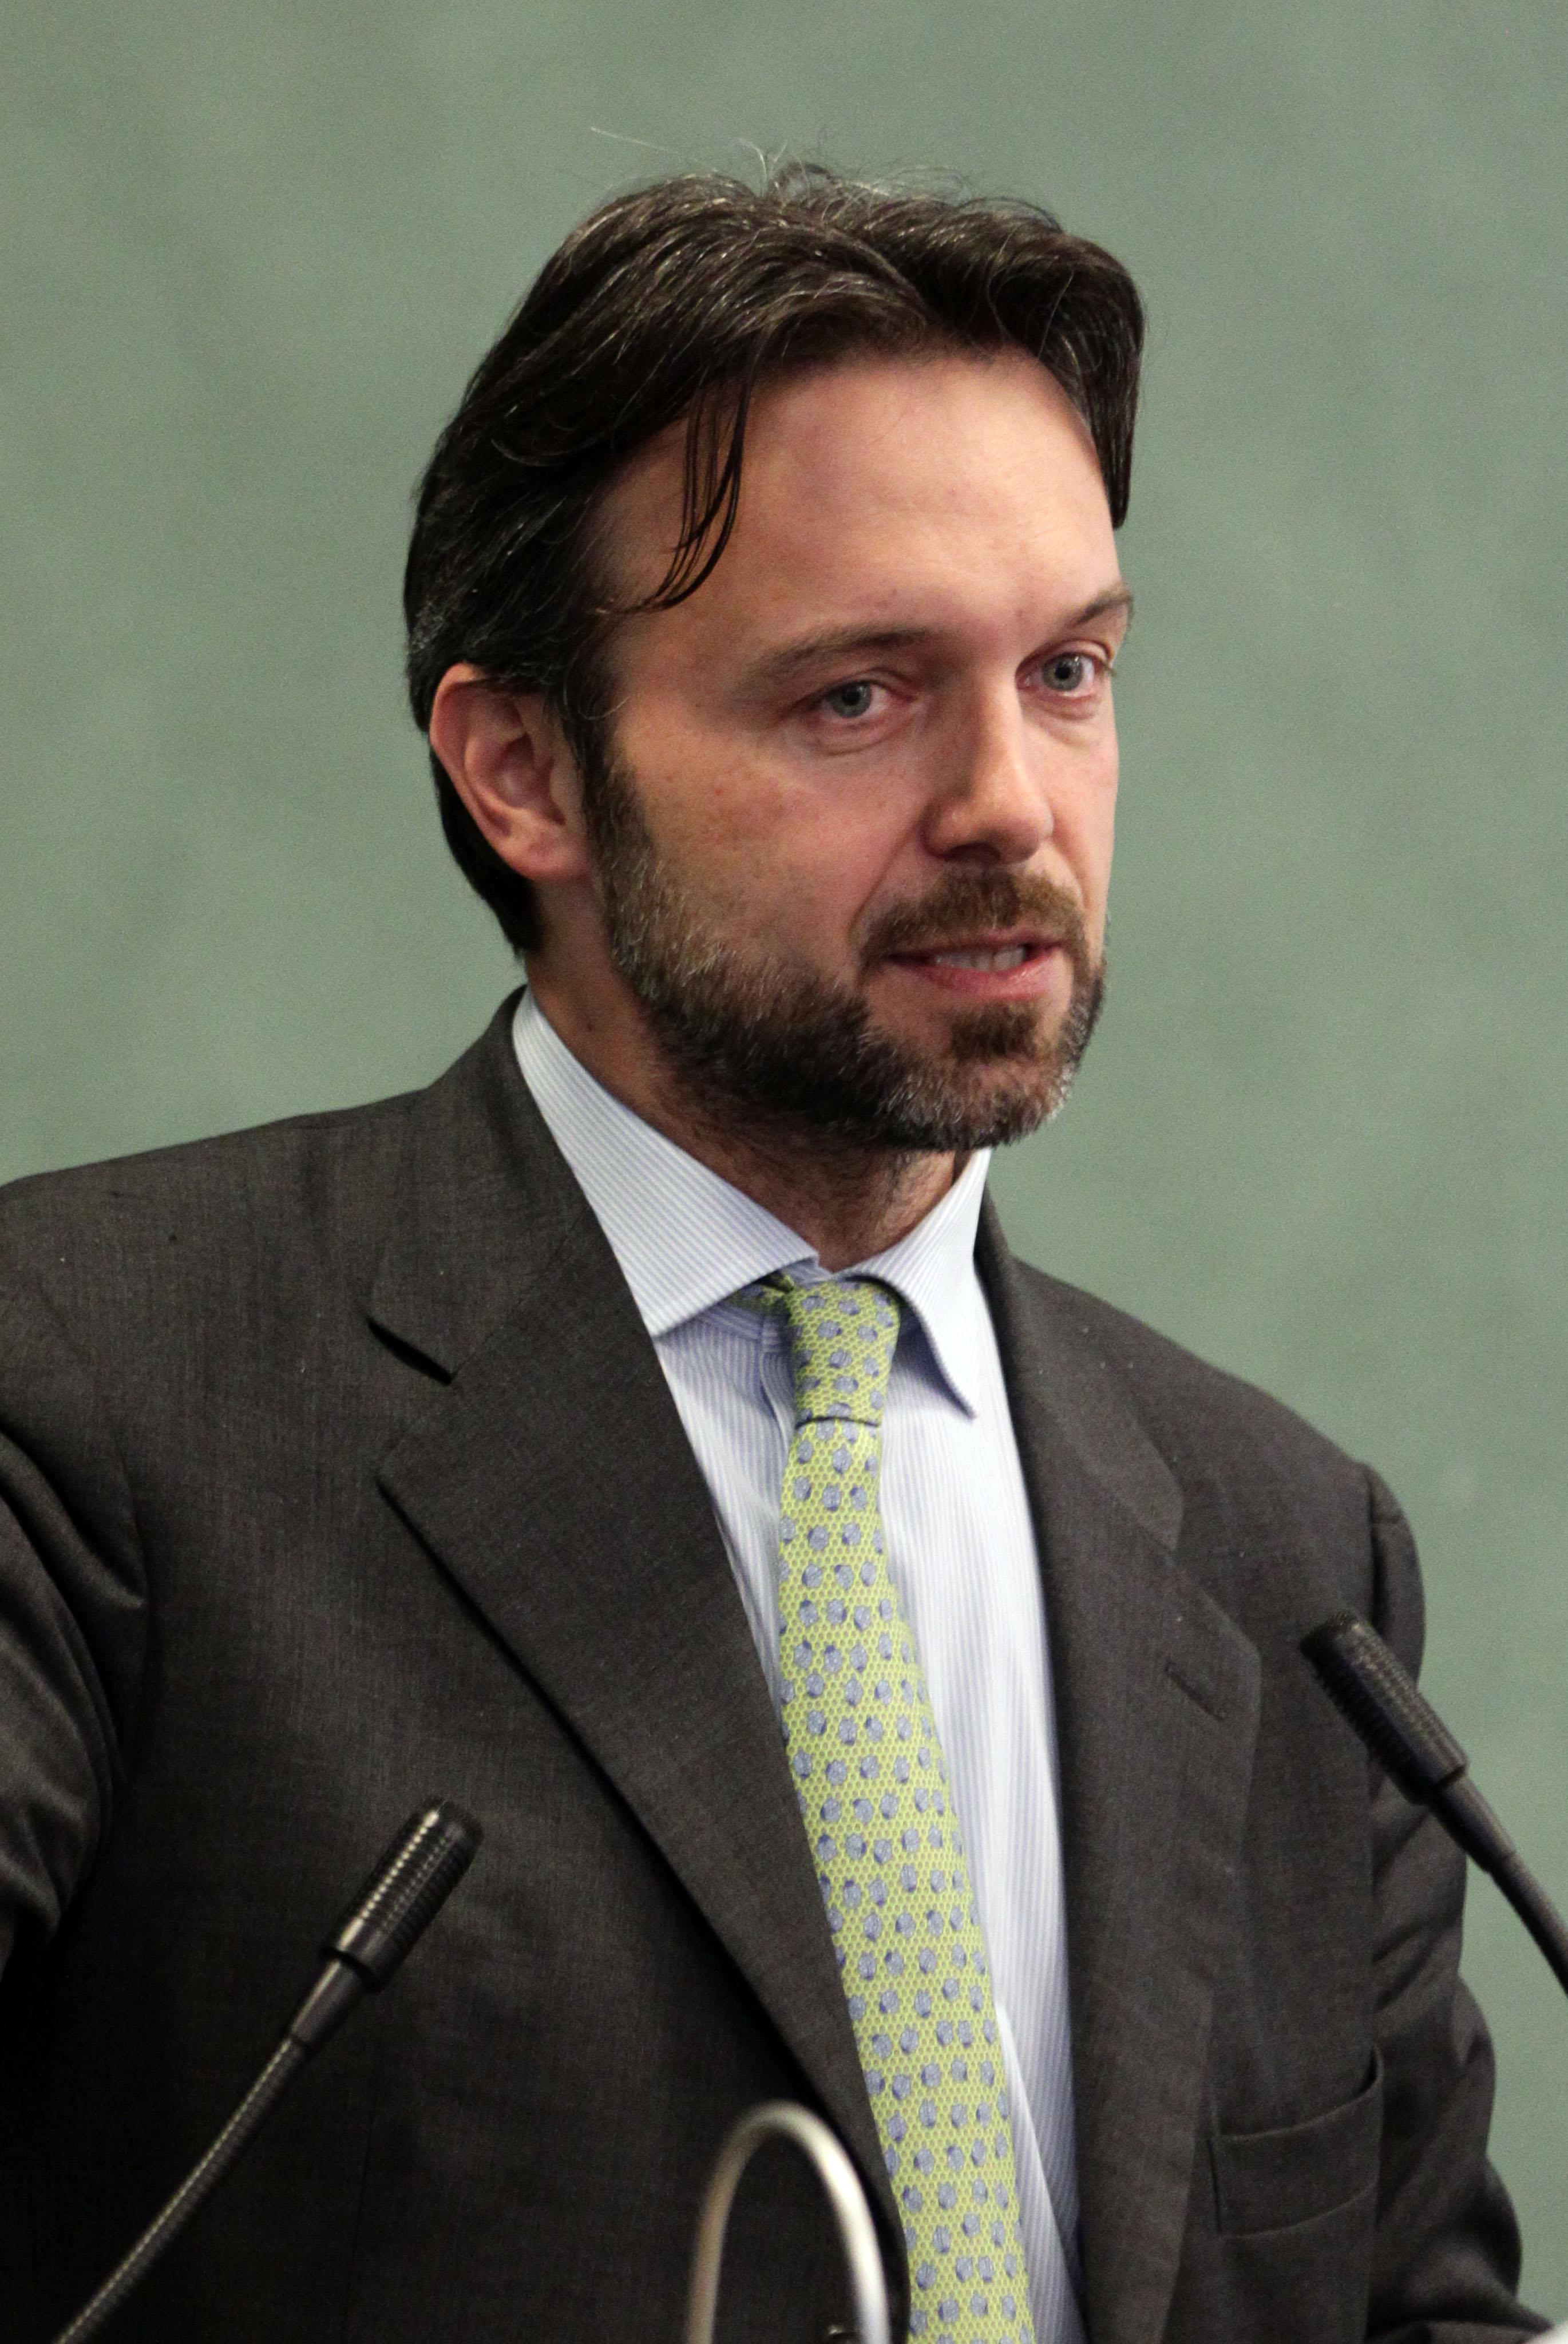 Guglielmo Garagnani